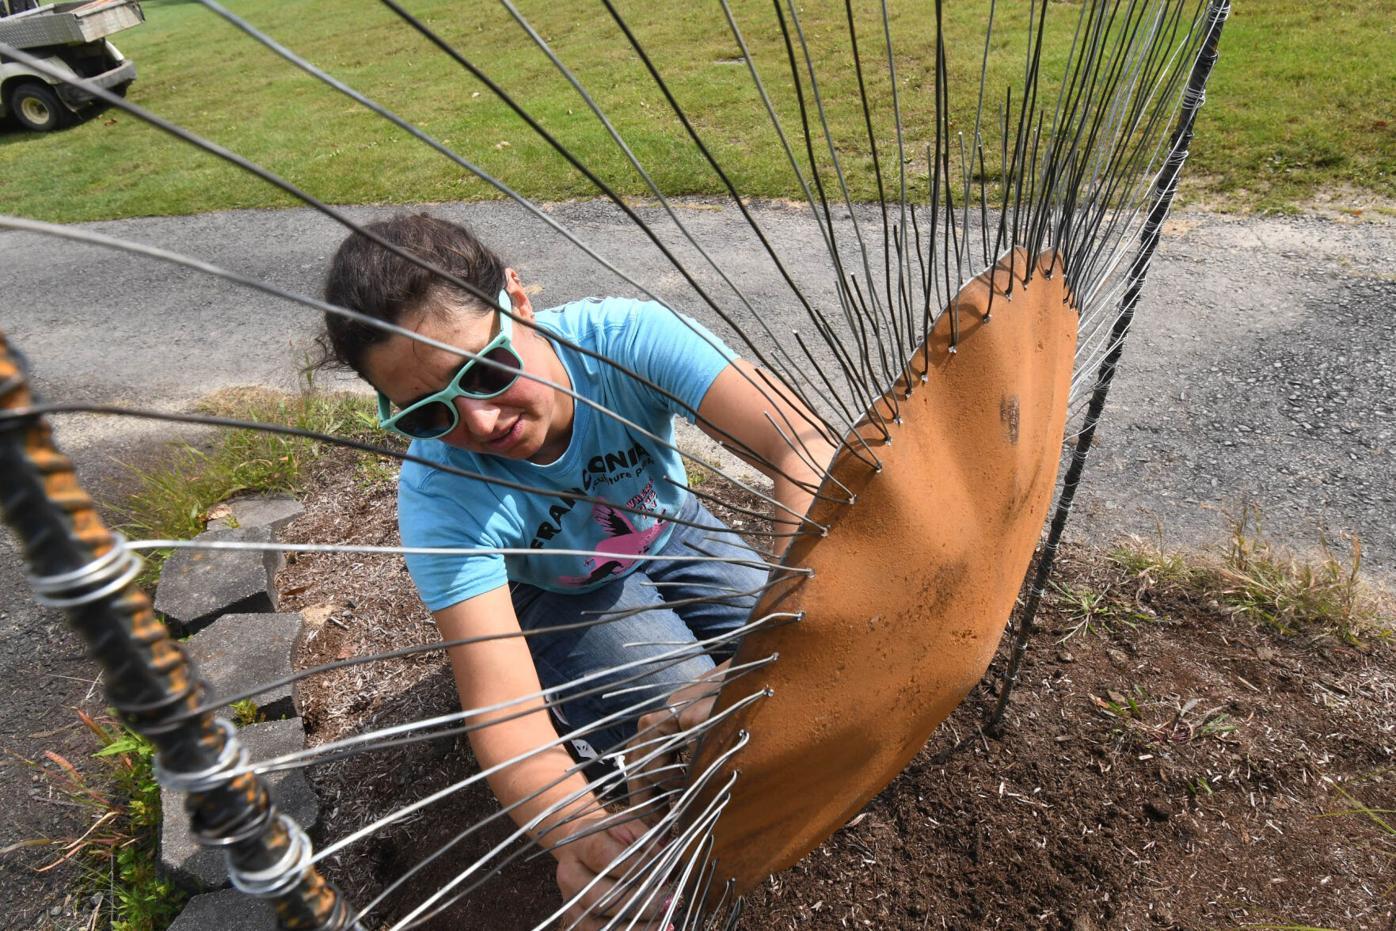 Radocchia installs a sculpture